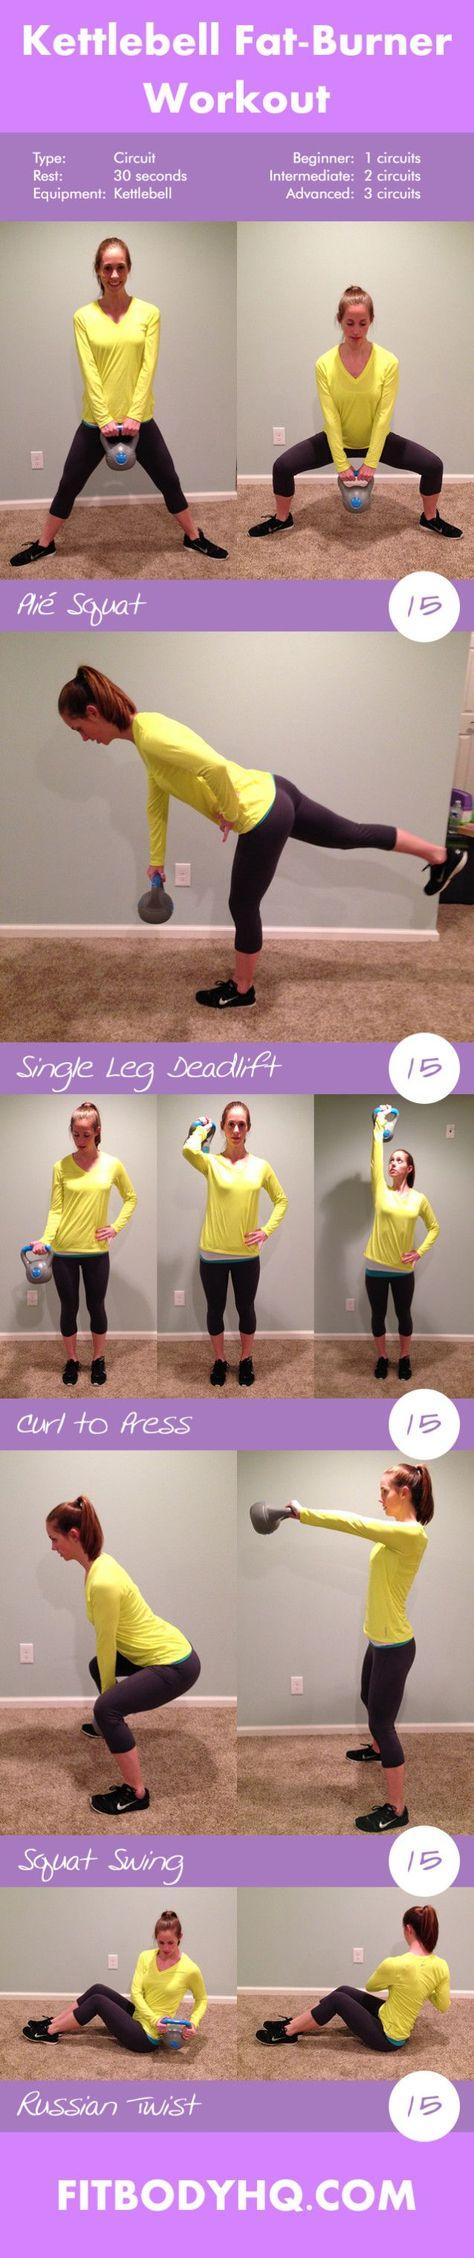 Kettlebell Fat-Burner Workout   FitBodyHQ